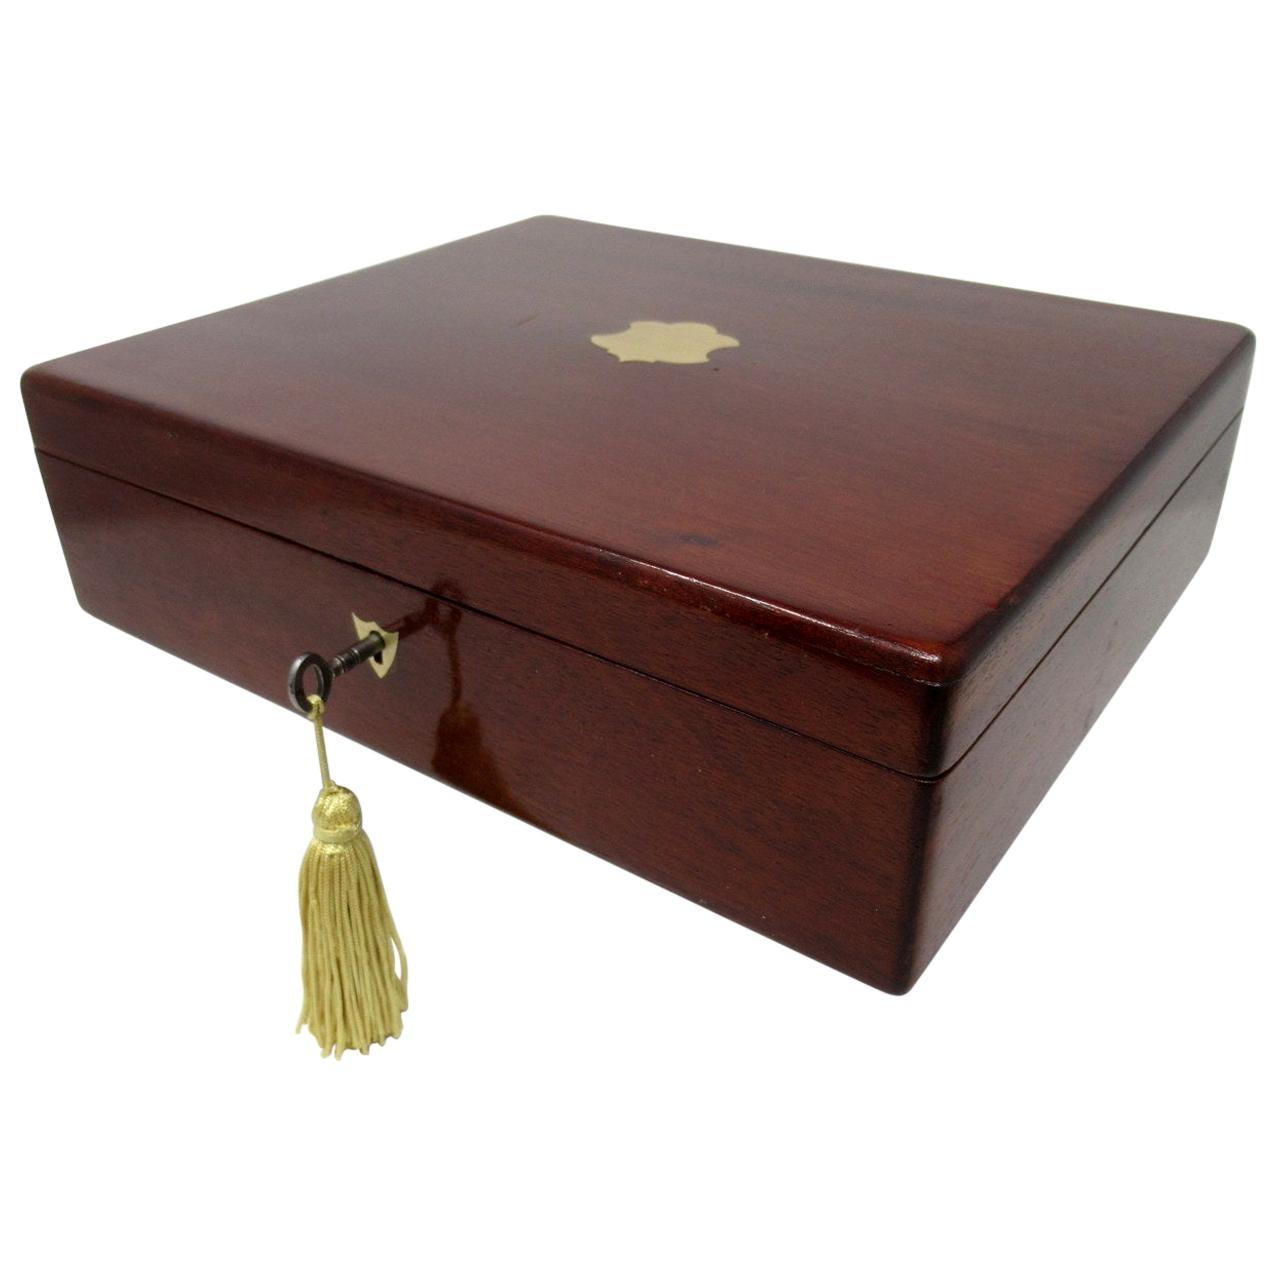 Antique Vintage Mahogany Wooden Jewelry or Gentleman's Cigar Box Casket